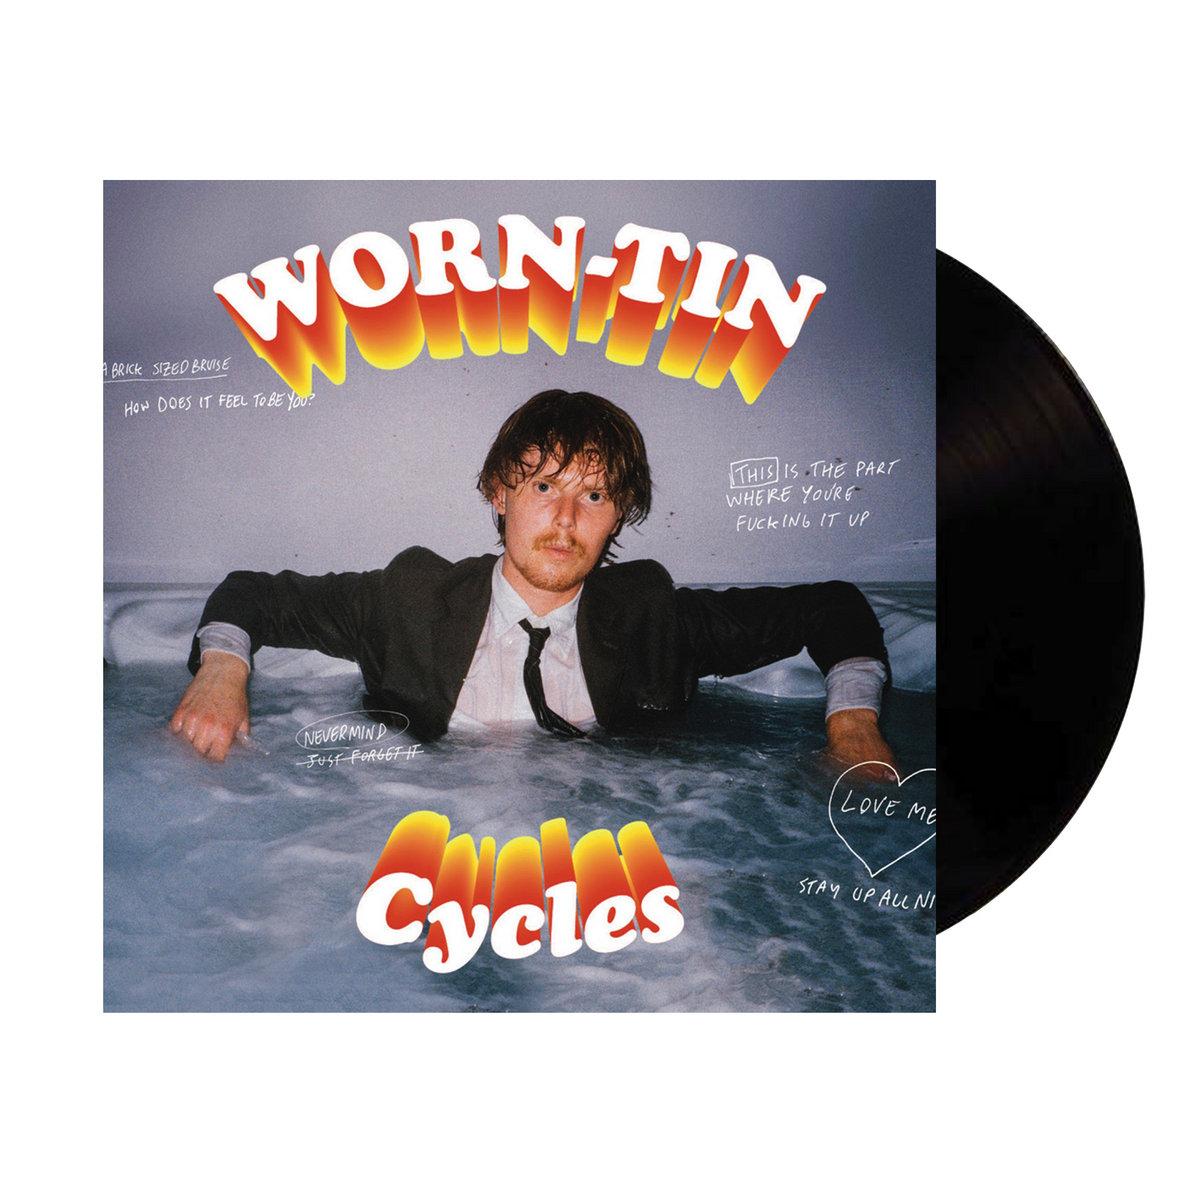 Cycles | Worn-Tin